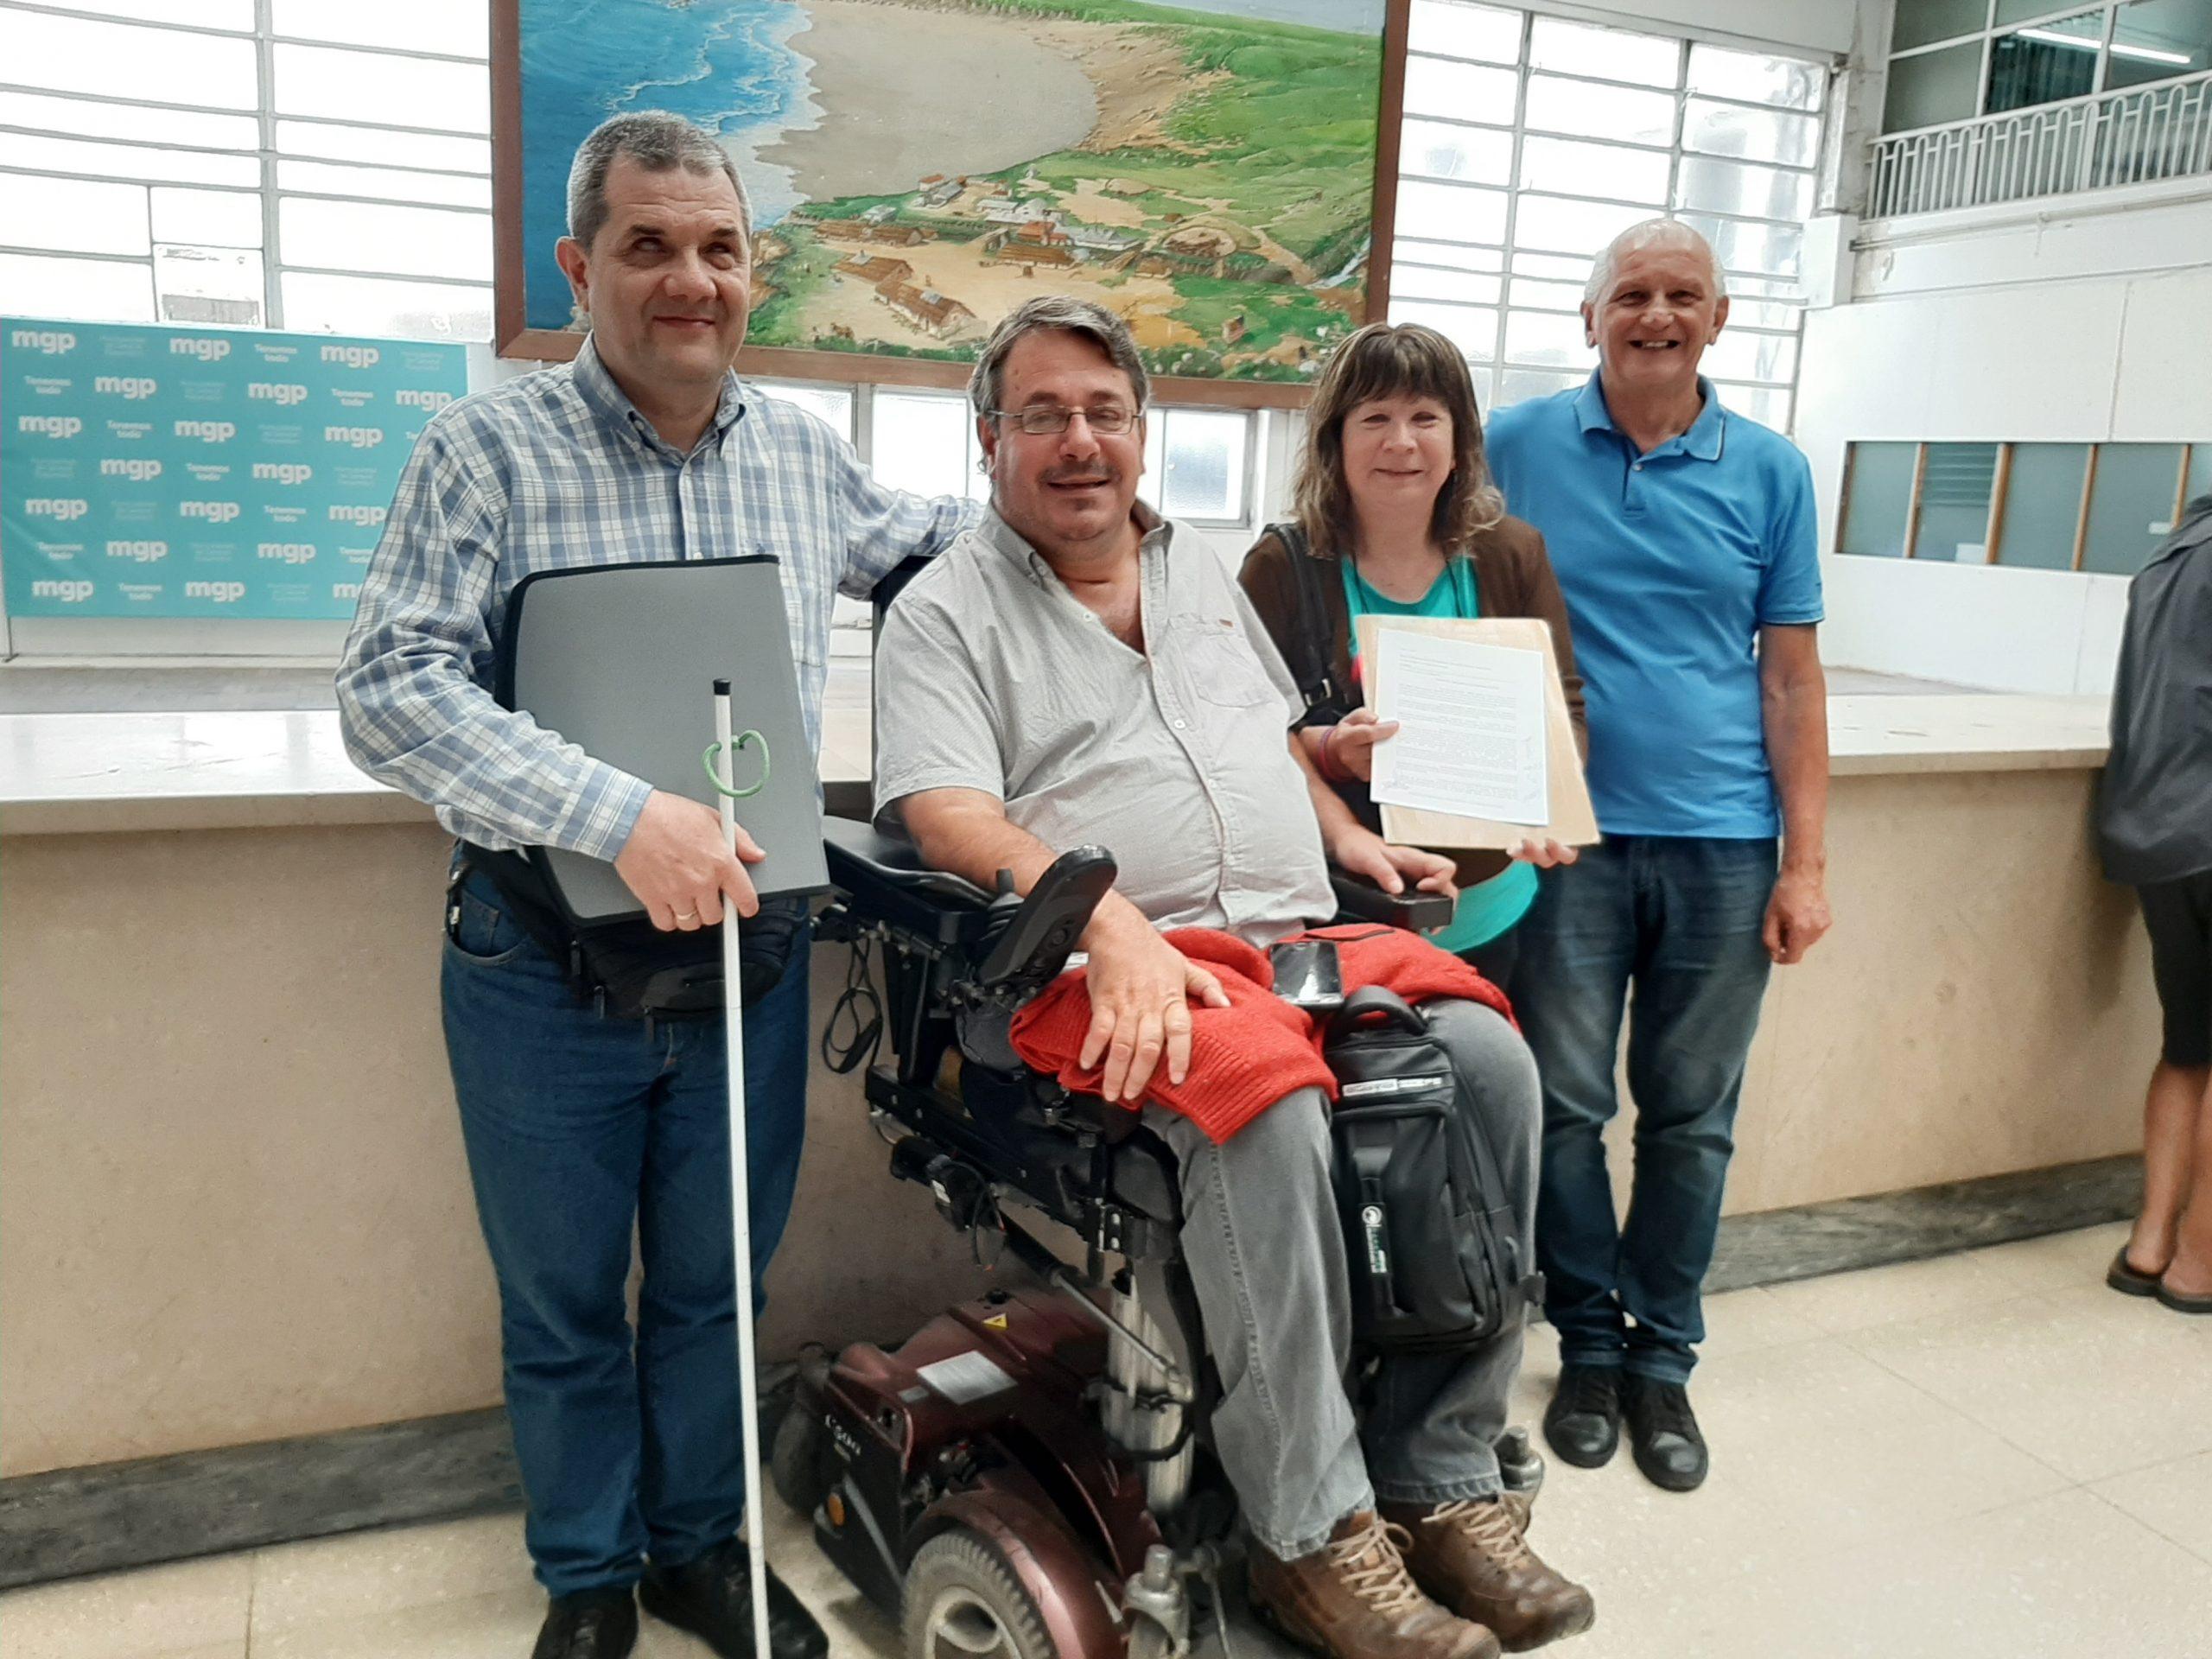 Carlos Mattos, Rodrigo Romera, Gloria Alvarez y Francisco Montanelli